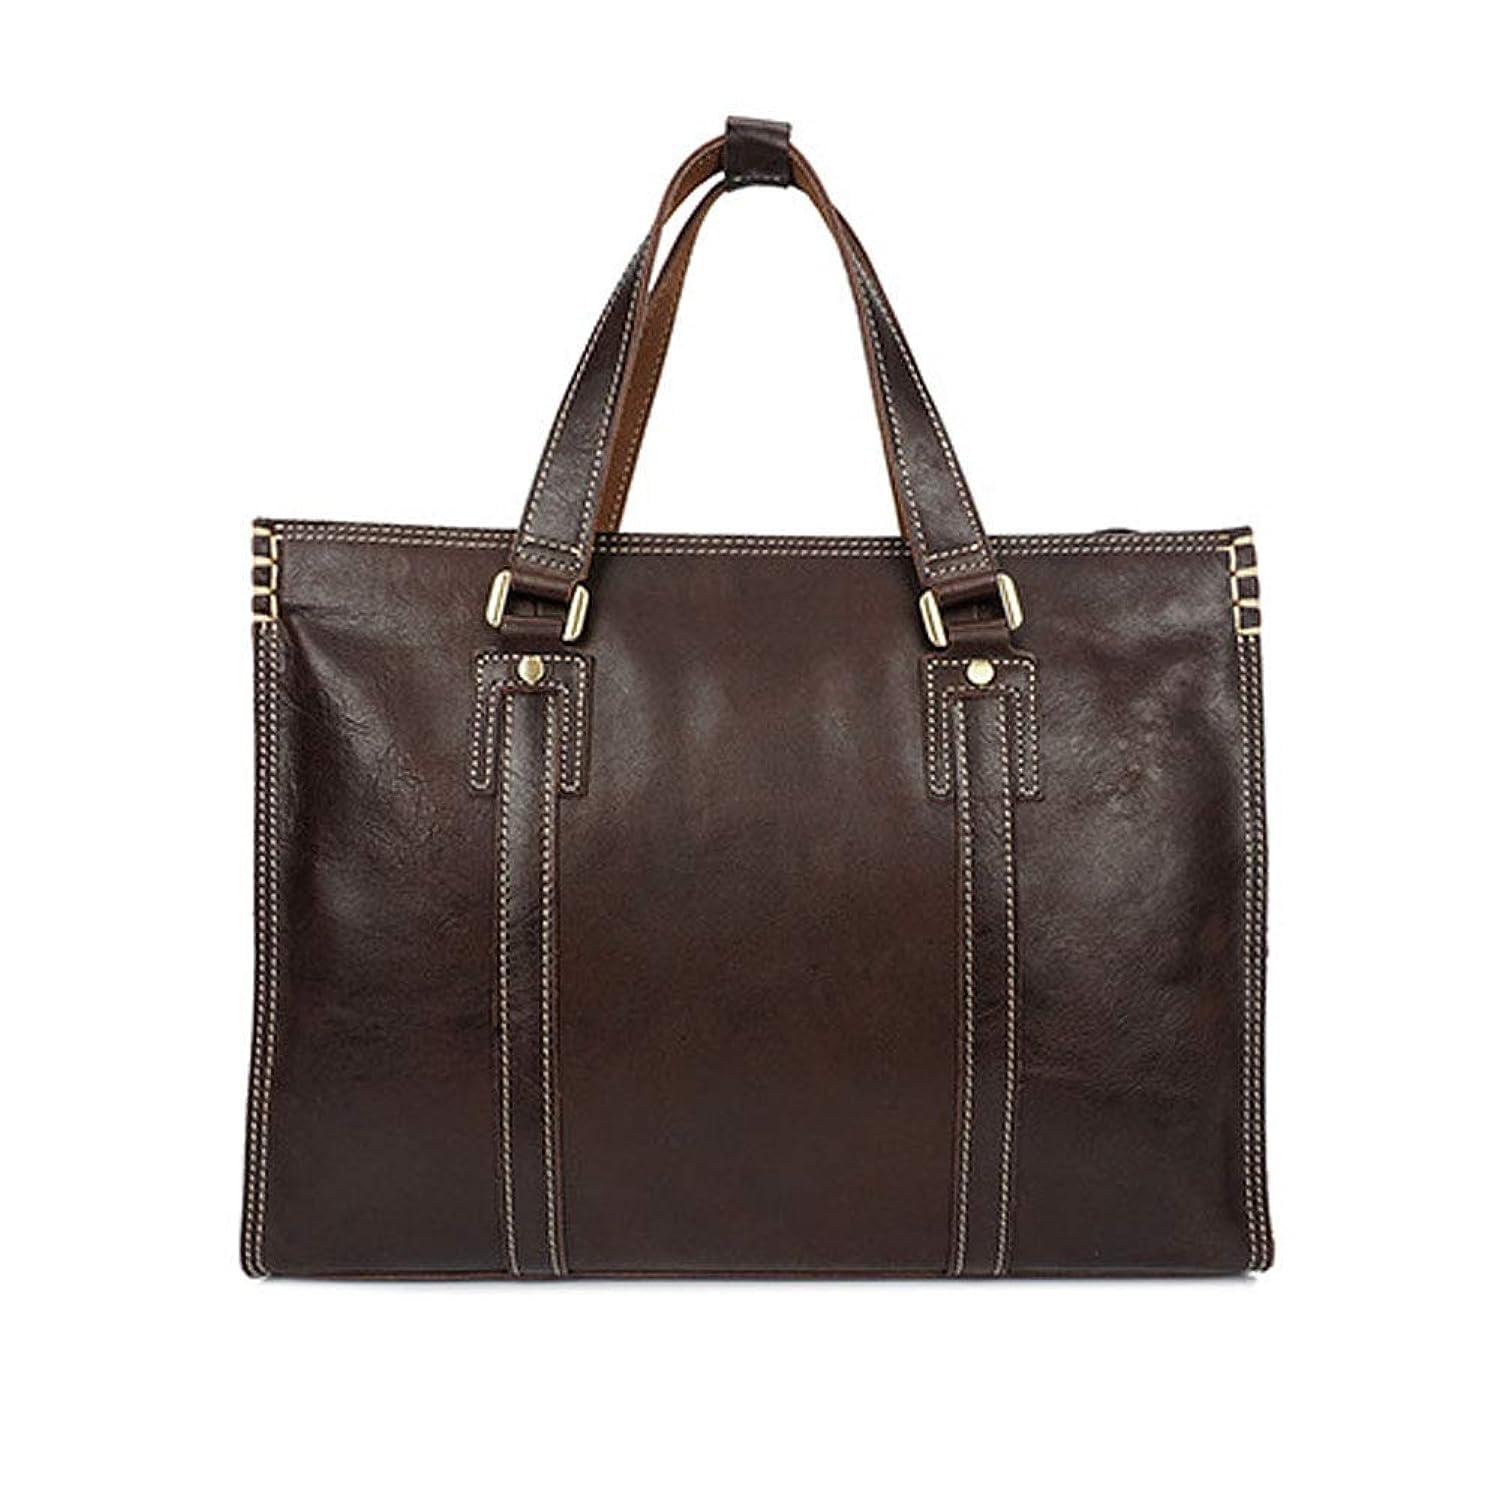 Jaiconfiance Men Leather Briefcase Men's Laptop Case with Handle/Laptop Case/Superbook Briefcase Carrying Case, Brown/Coffee Men Vintage Leather Messenger Bag (Color : Brown)